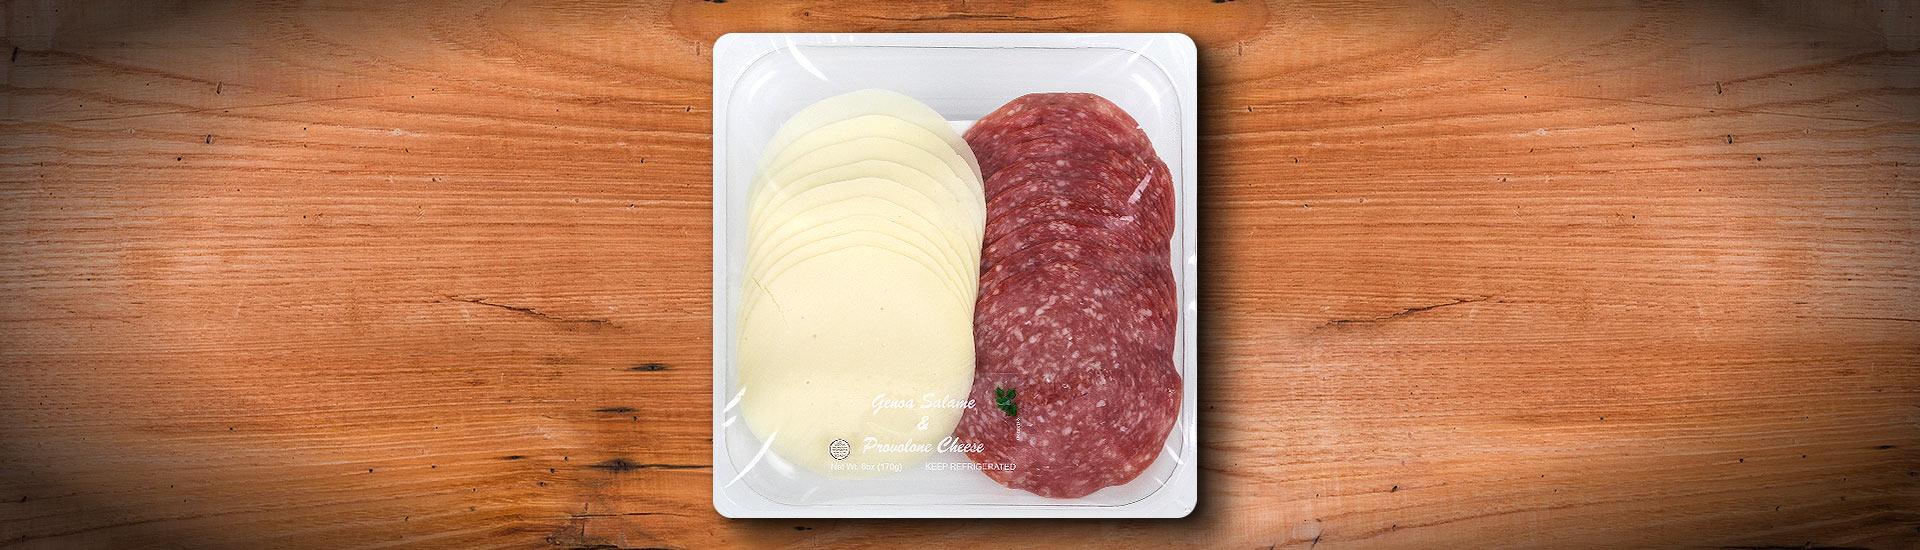 GENOA Salame & PROVOLONE Cheese FRESCO